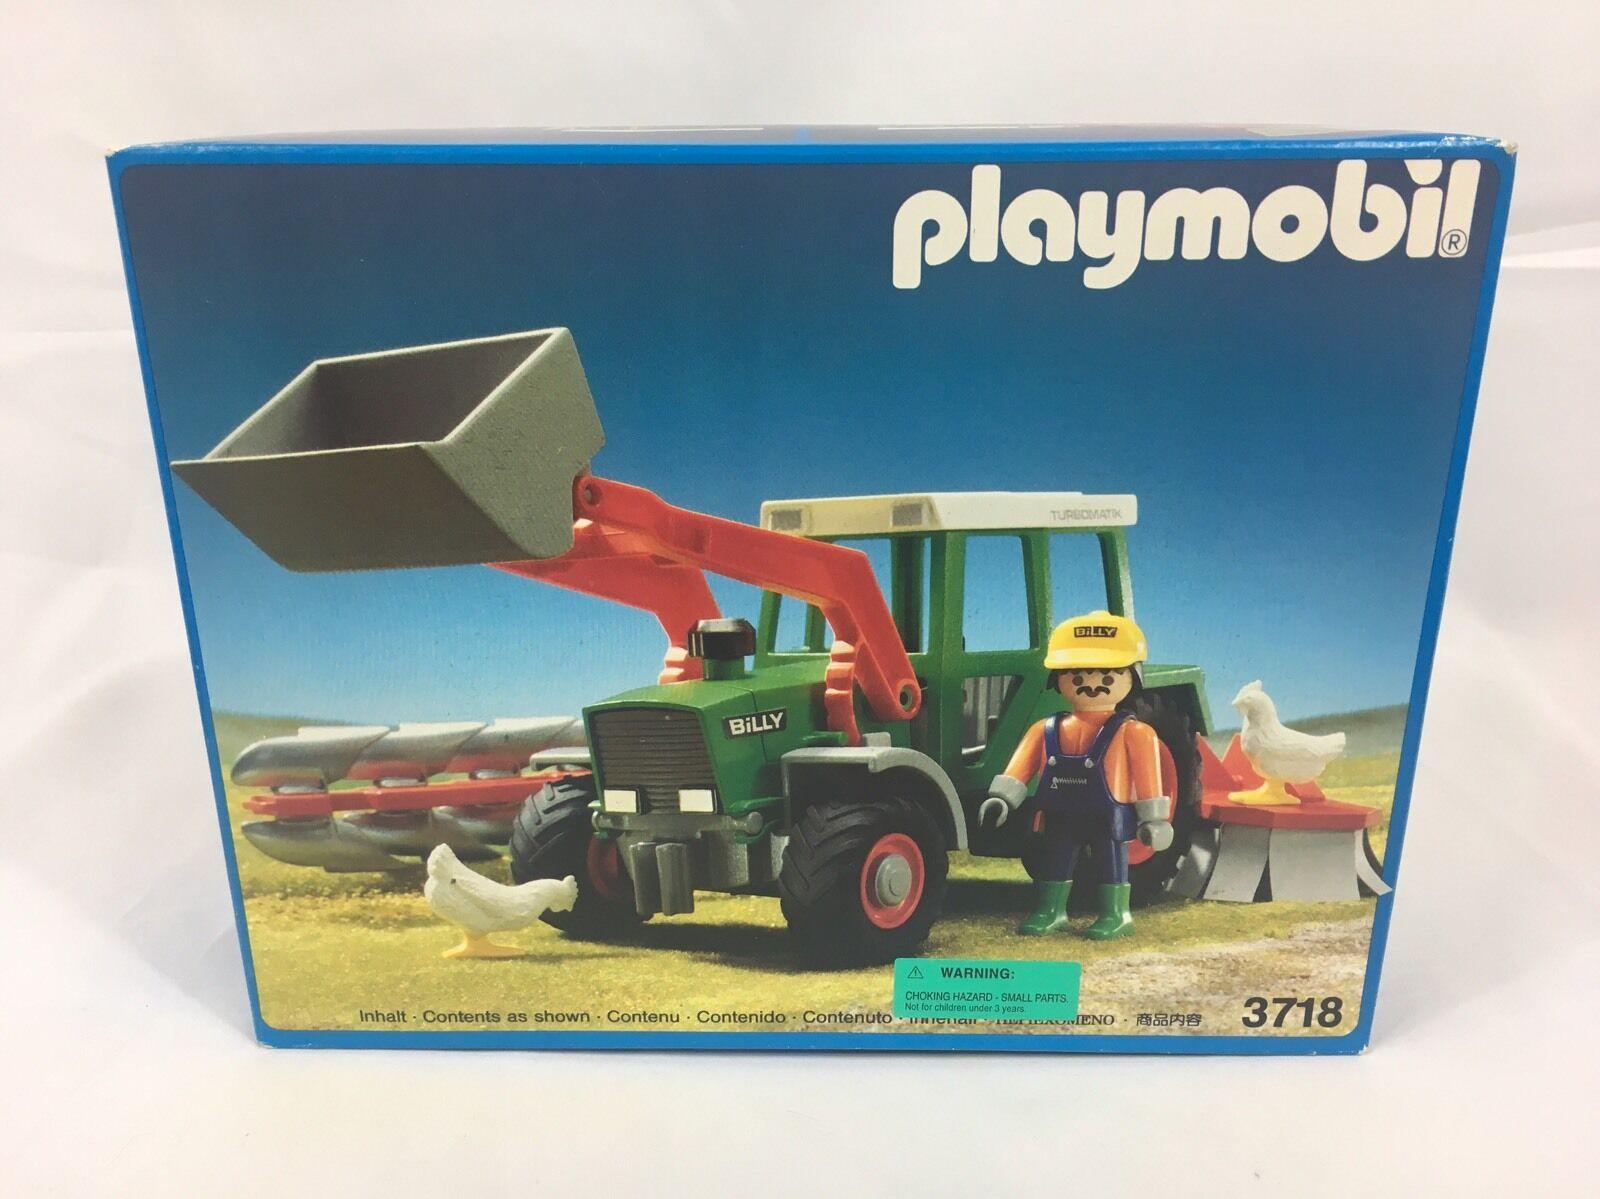 NEW 1992 PLAYMOBIL 3718 FARM FRONT LOADER  TRACTOR TILLER  MINT SEALED BOX